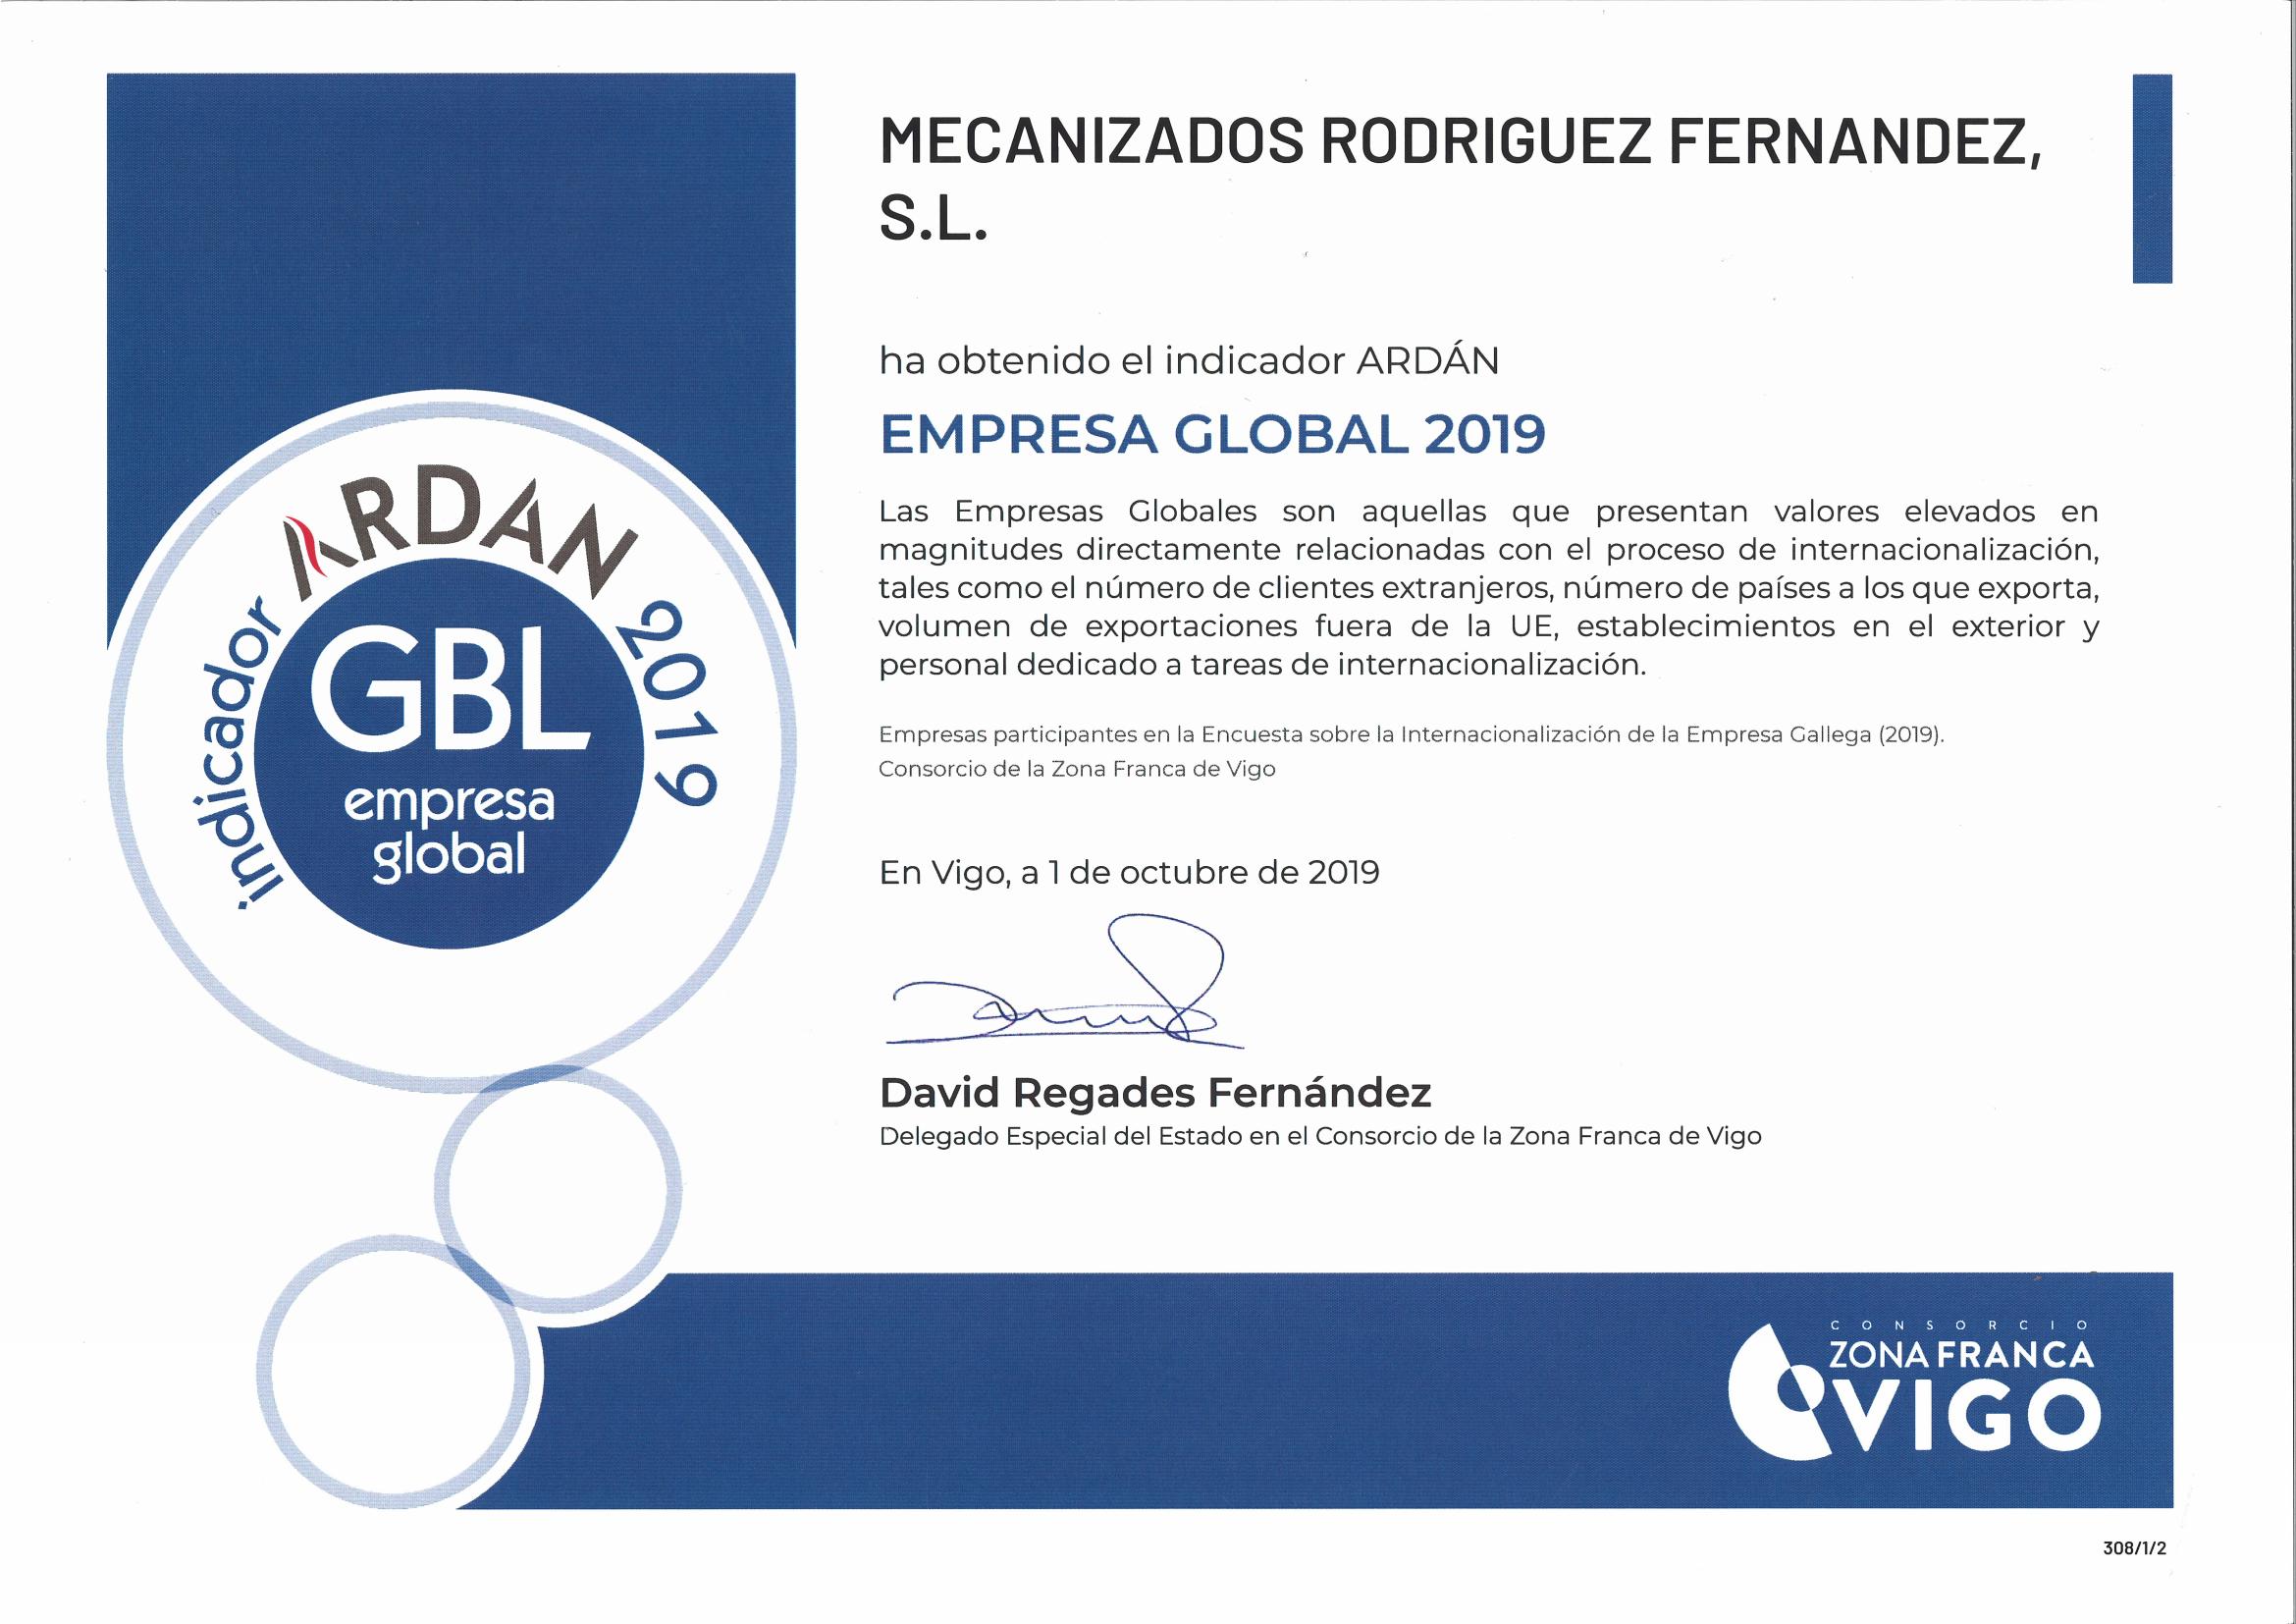 ARDAN_EMPRESA-GLOBAL-2019.png